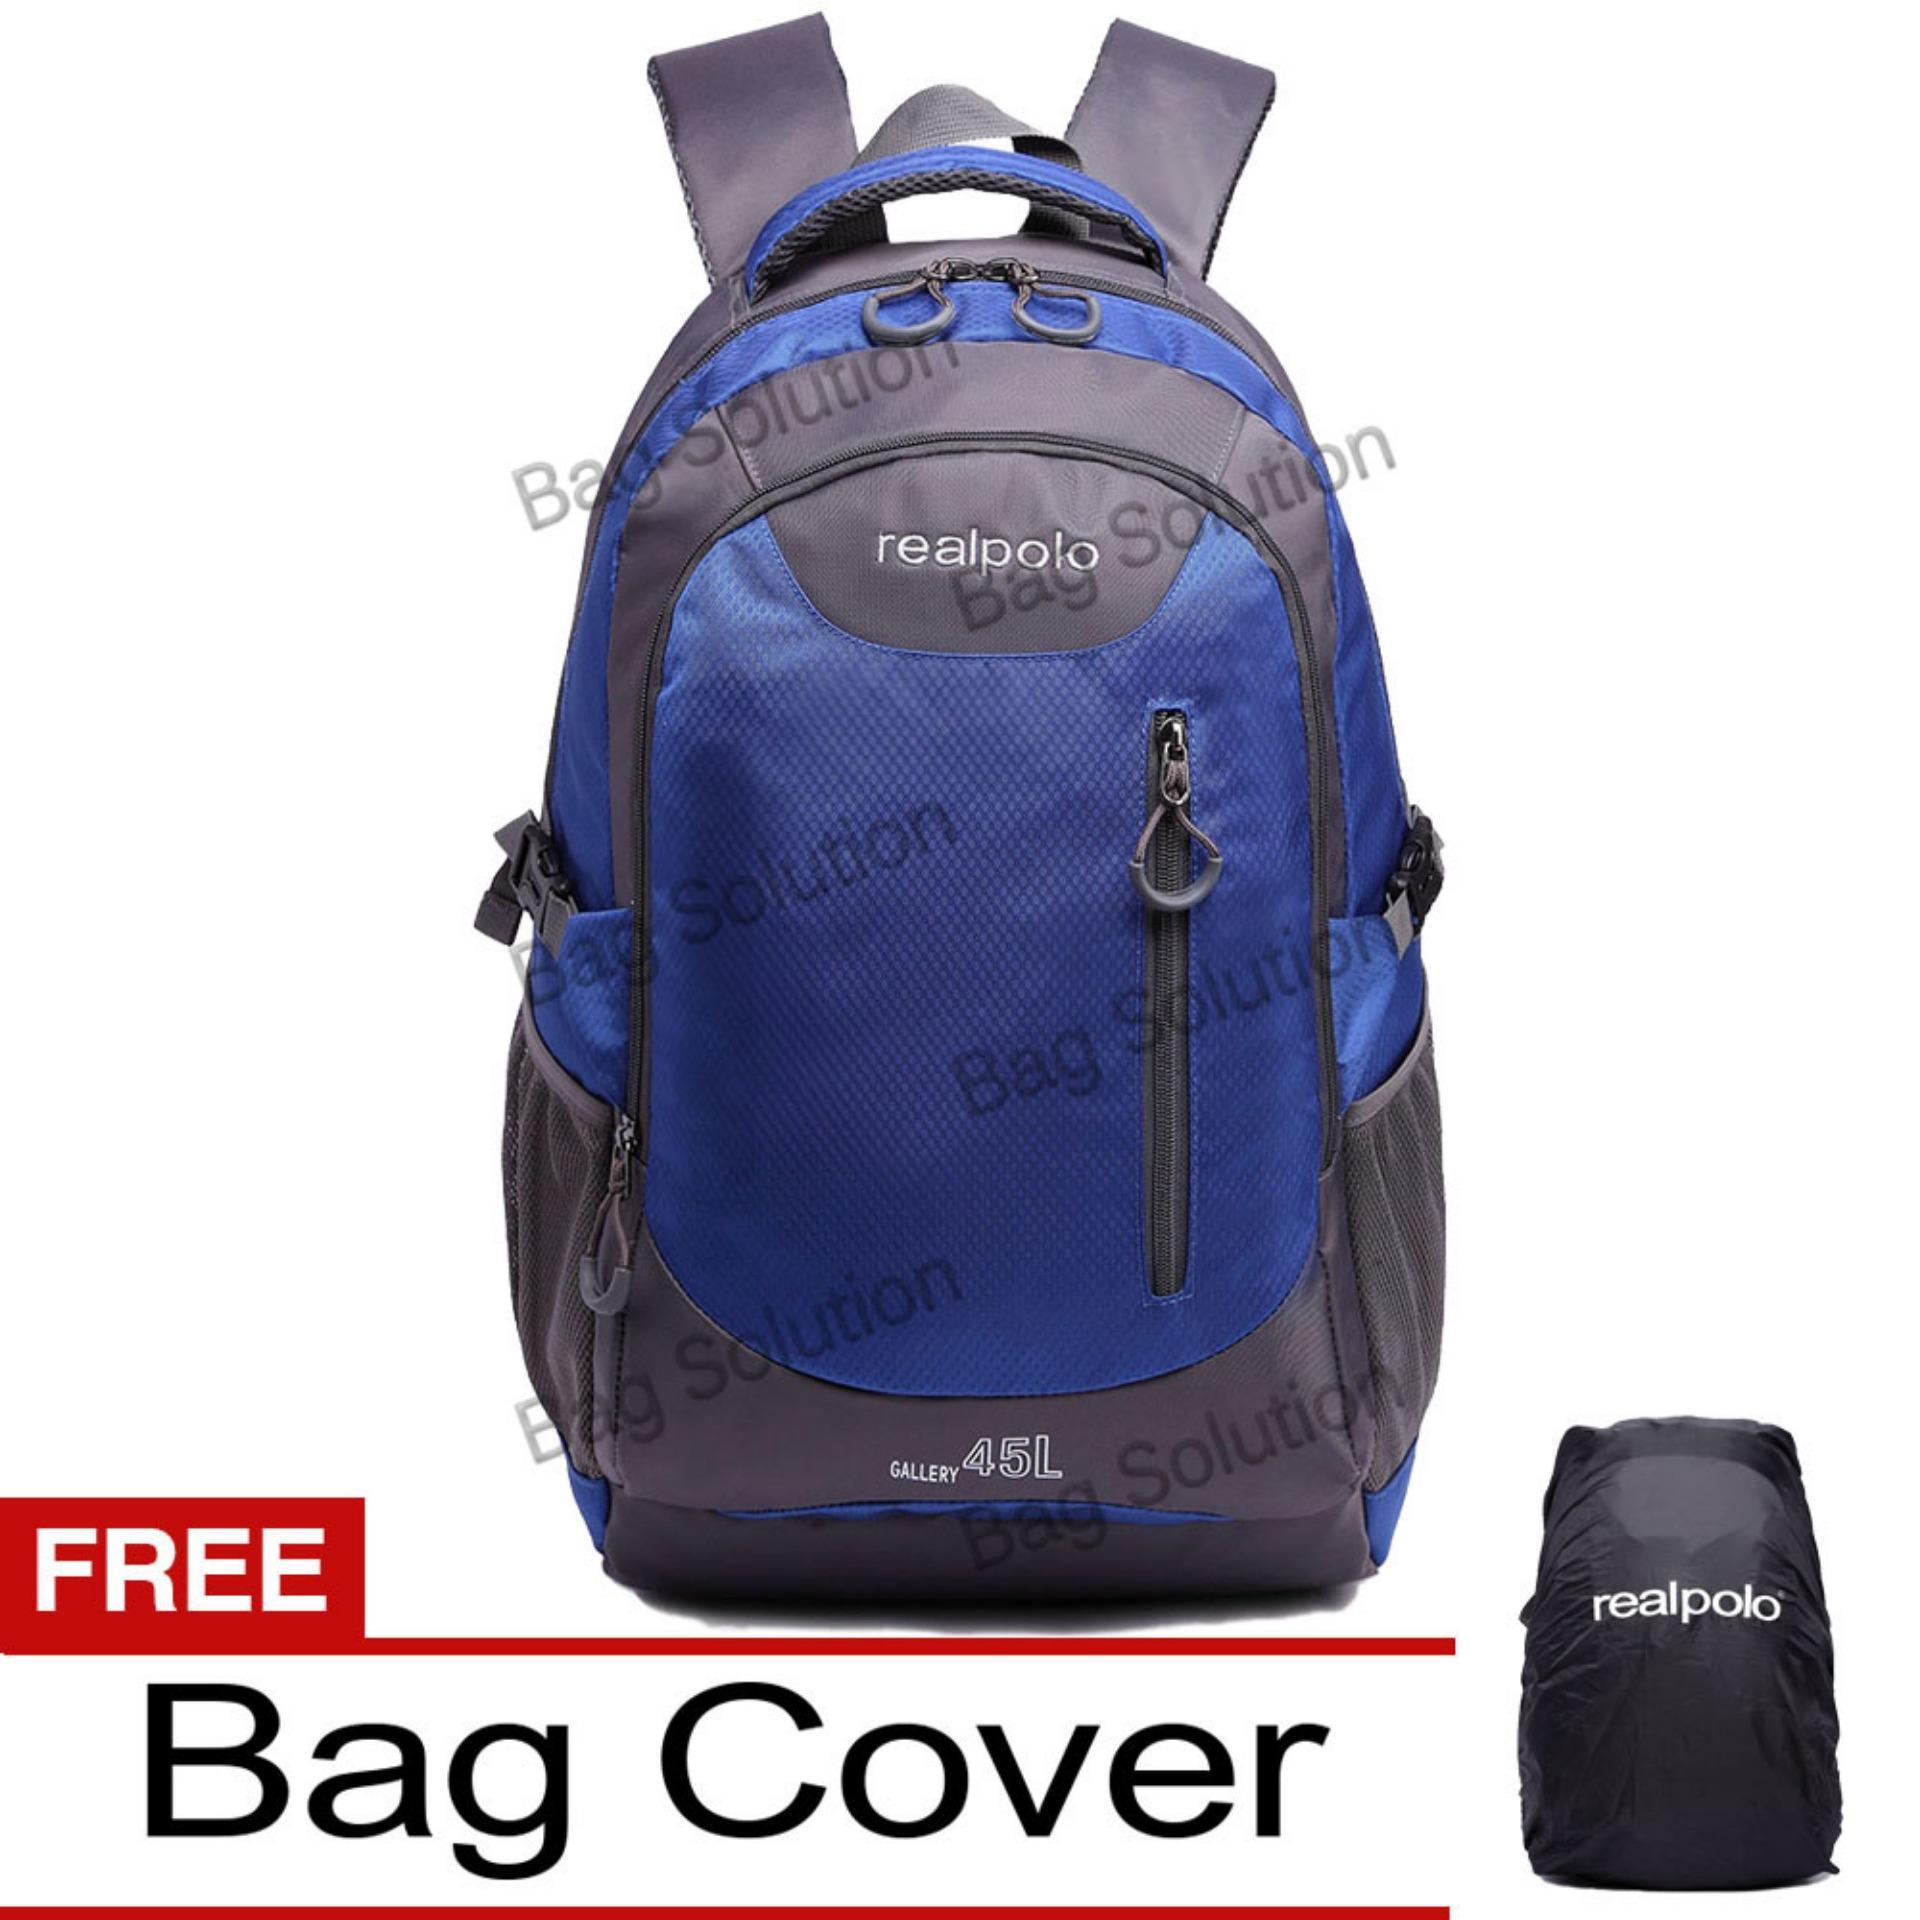 Beli Real Polo Tas Ransel Kasual Jumbo 6333 Backpack Xl Bonus Bag Cover Biru Murah